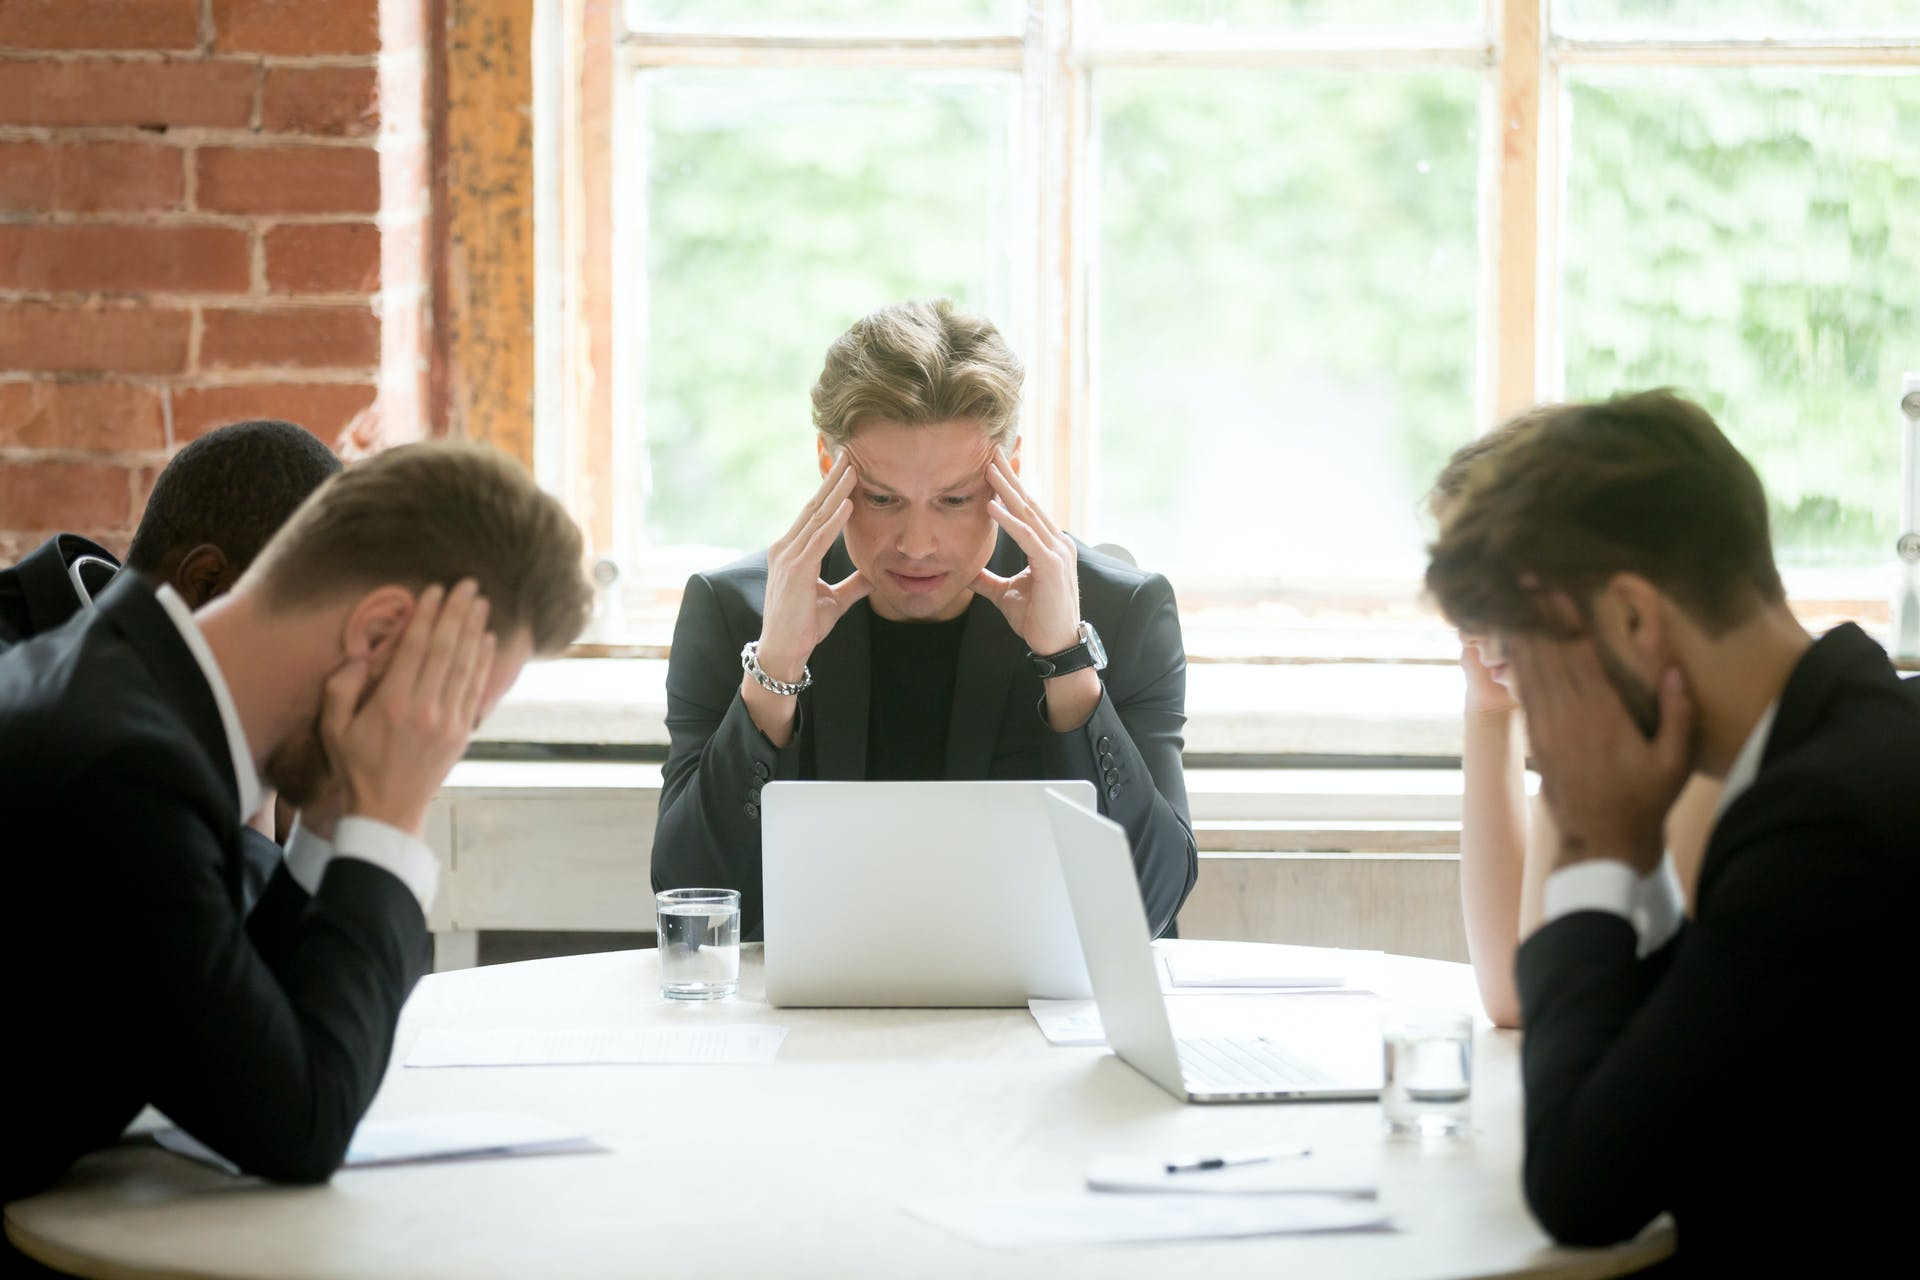 gérer communication crise